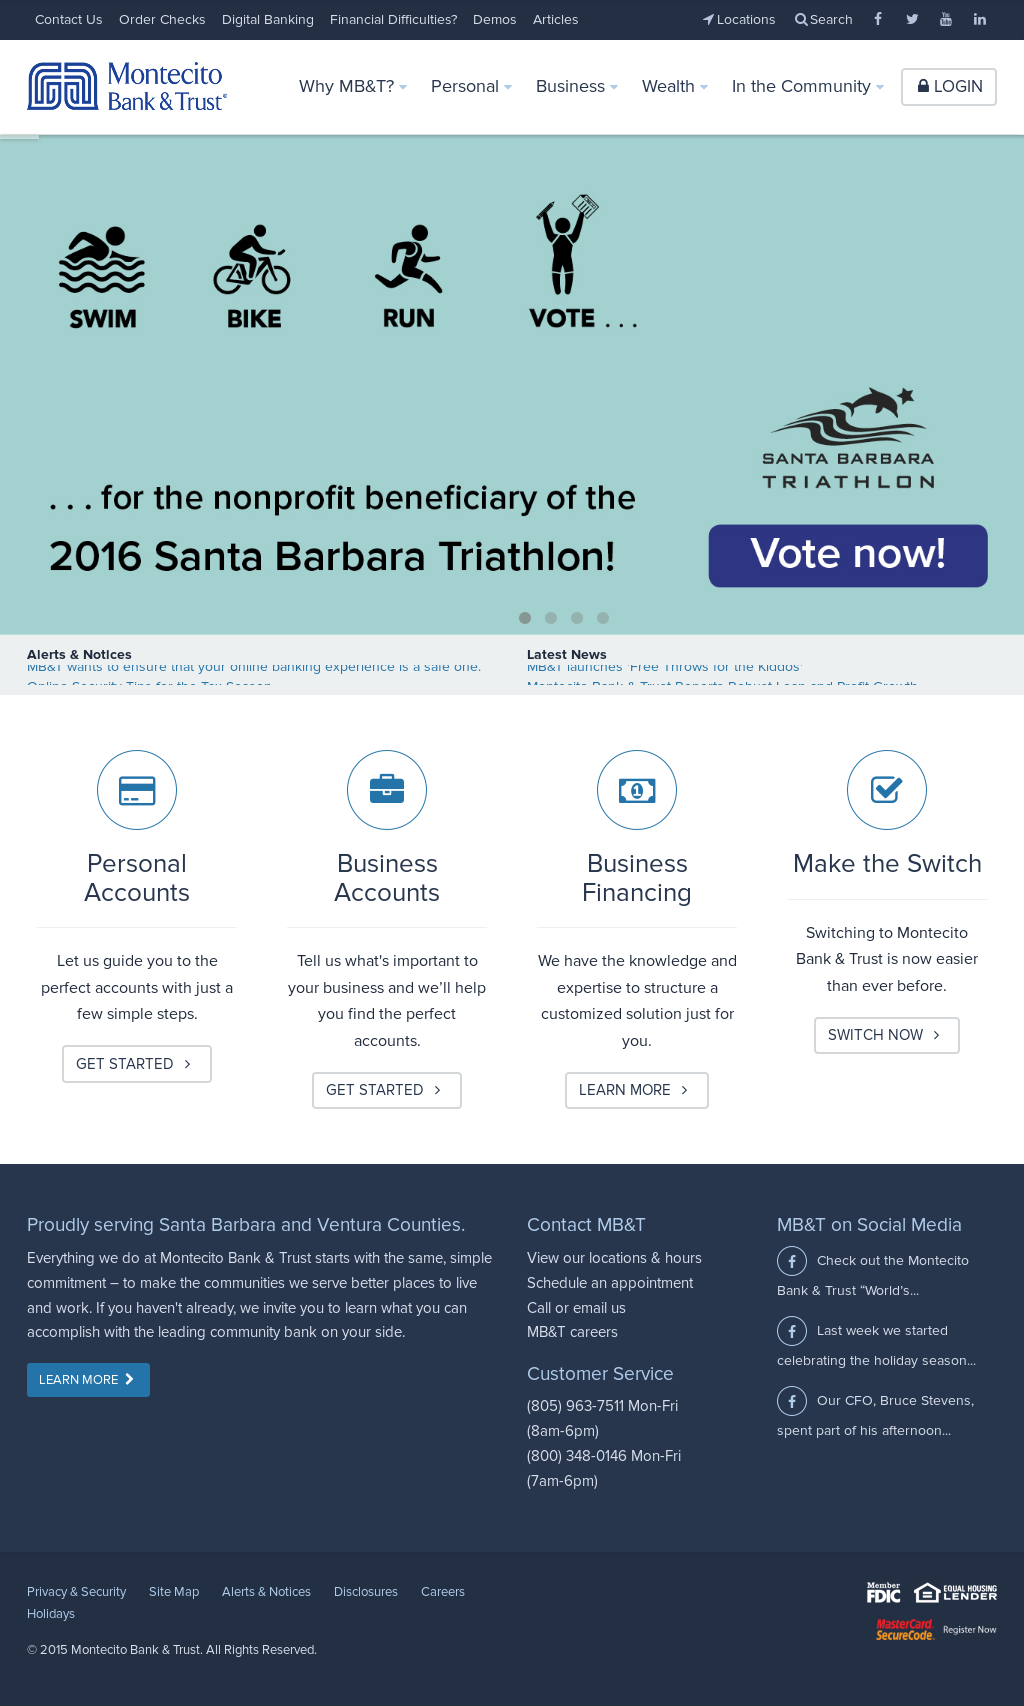 Montecito Competitors, Revenue and Employees - Owler Company